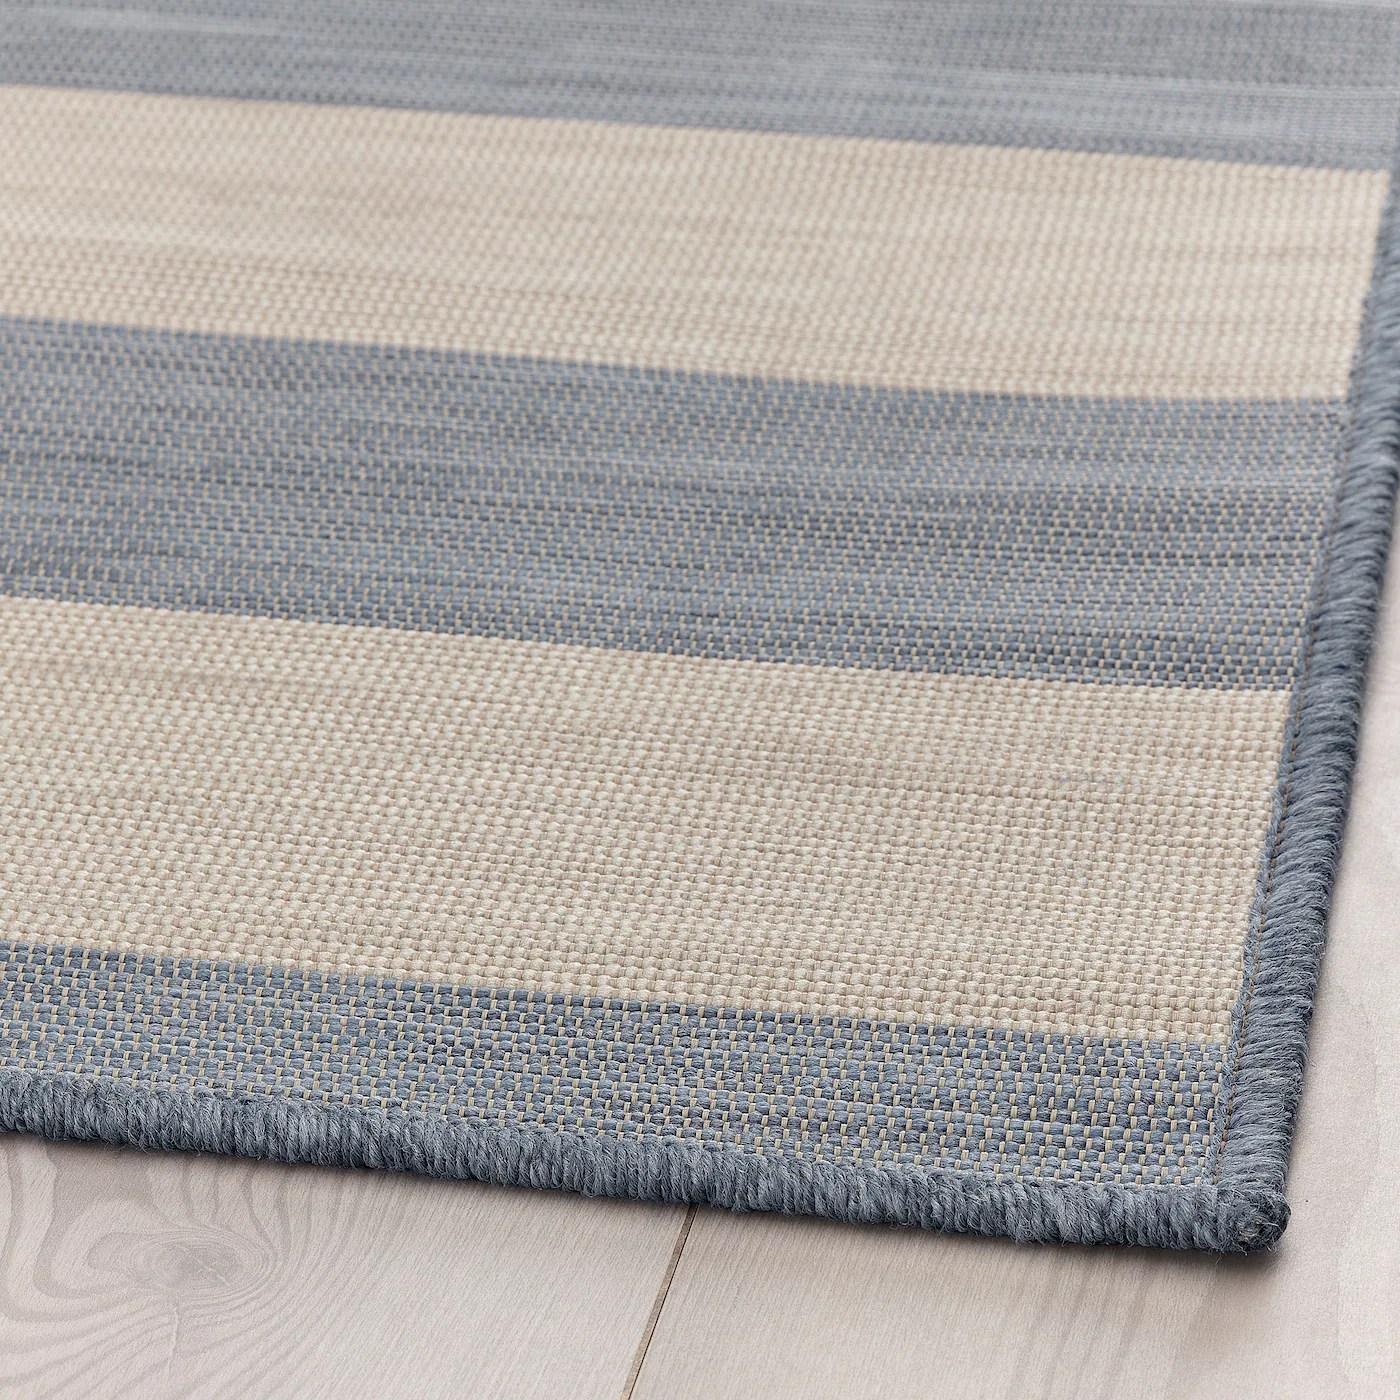 vrensted tapis tisse a plat int exterieur beige bleu clair 133x195 cm